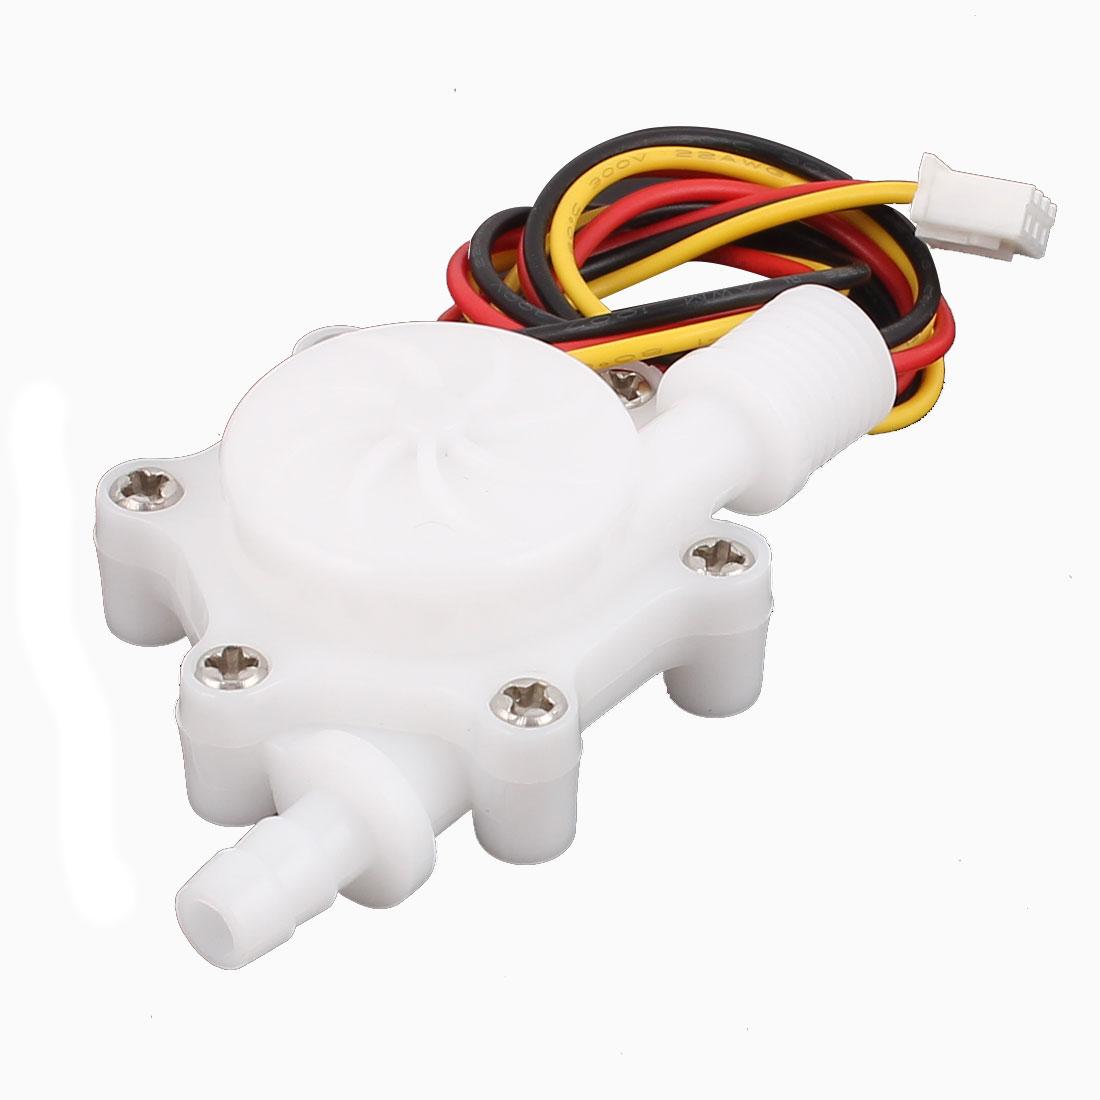 0.2-2.5L/min G1/4 Thread 6mm OD Hall Effect Water Flow Counter Sensor SEN-HZ06FA